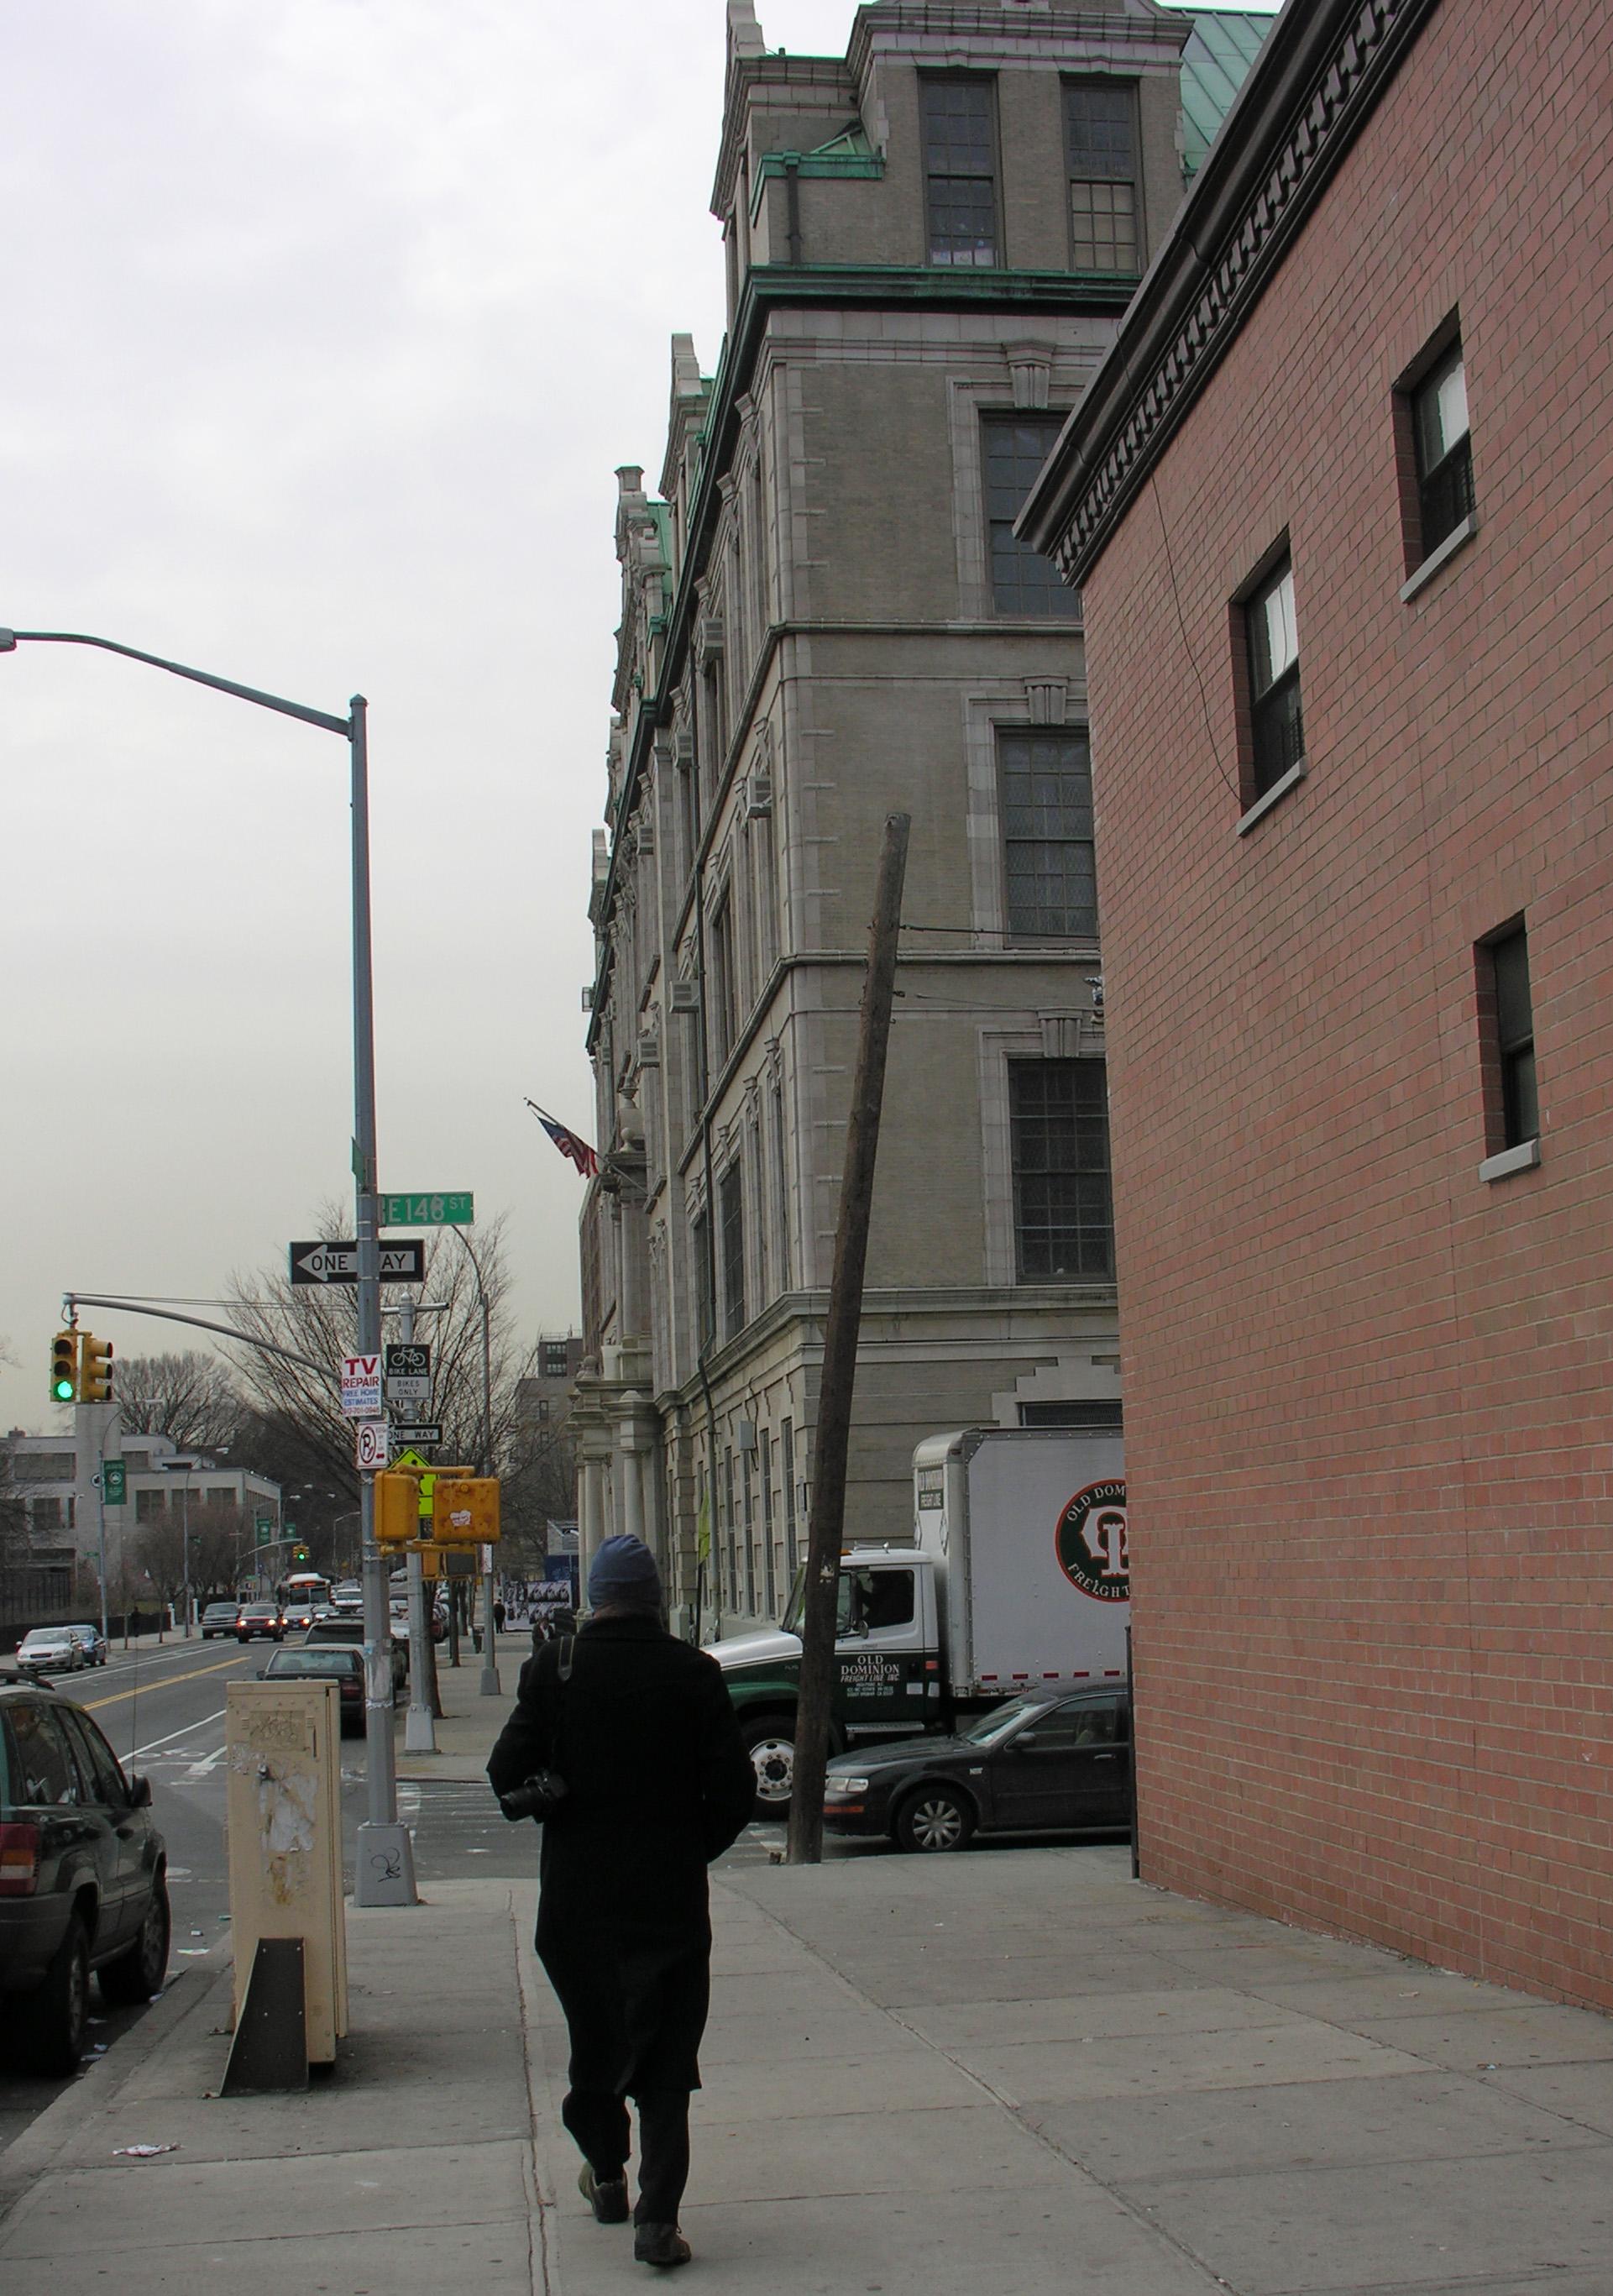 file phillip approaches 427 st ann s avenue the bronx new yotk